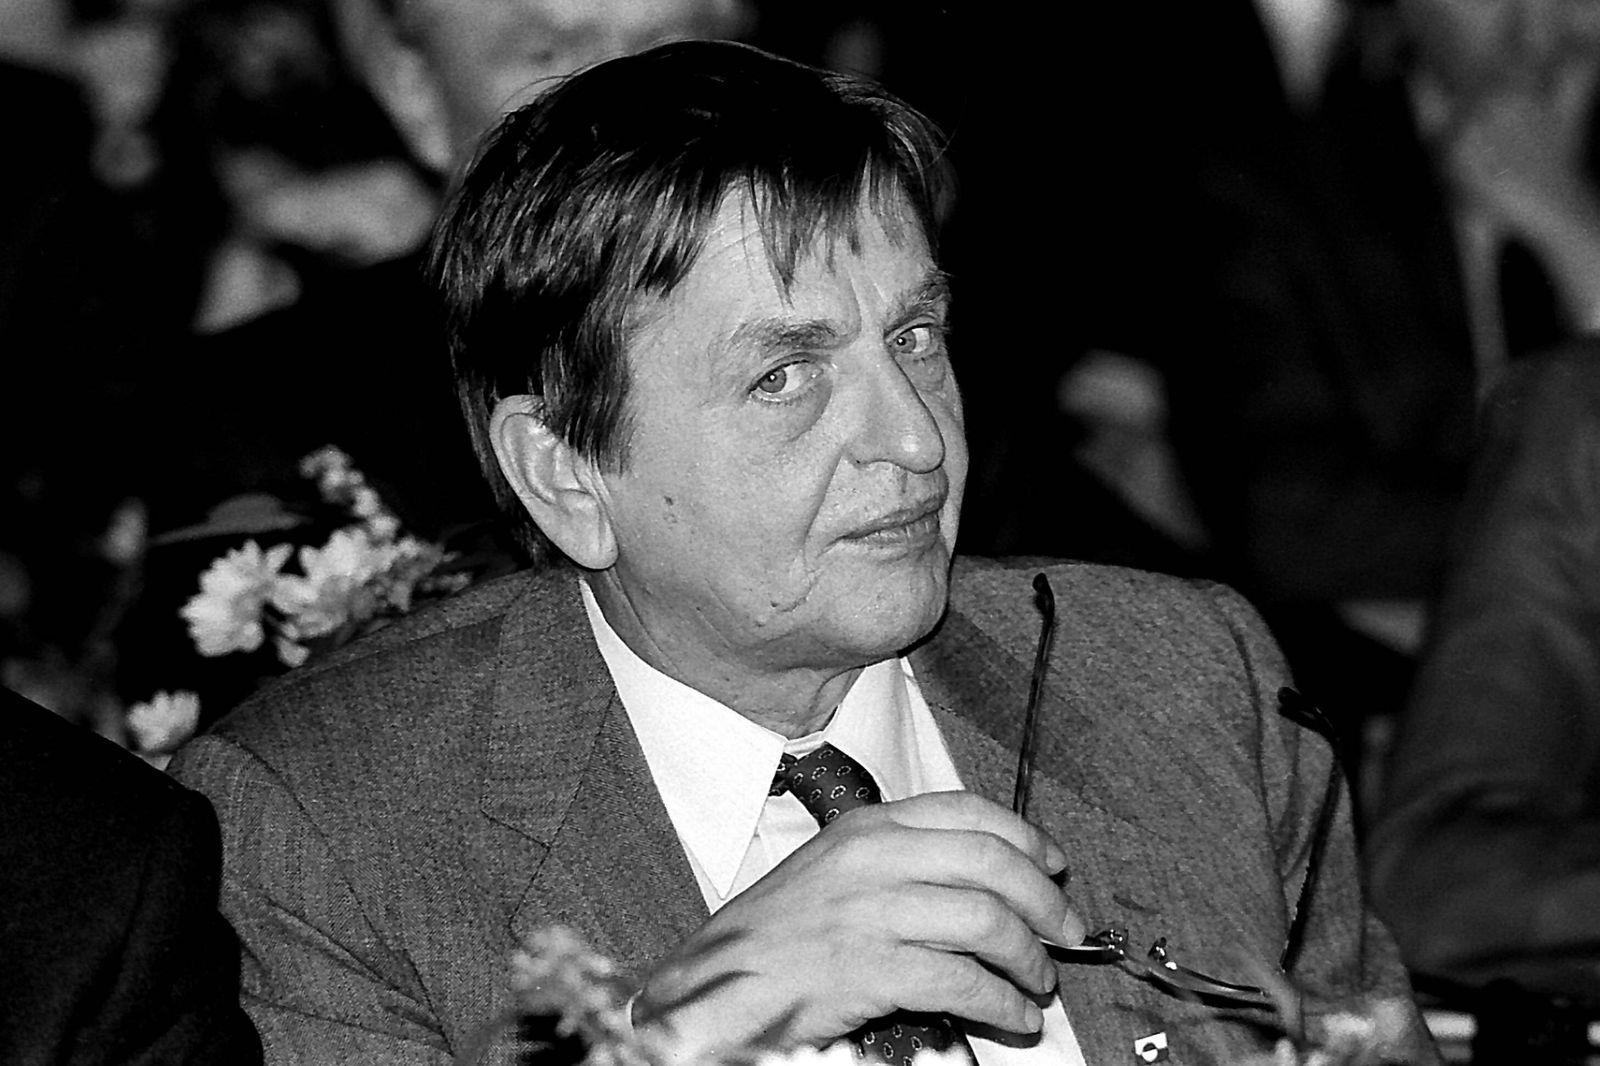 Premierminister Olof Palme (Schweden) in Stockholm PUBLICATIONxNOTxINxDEN